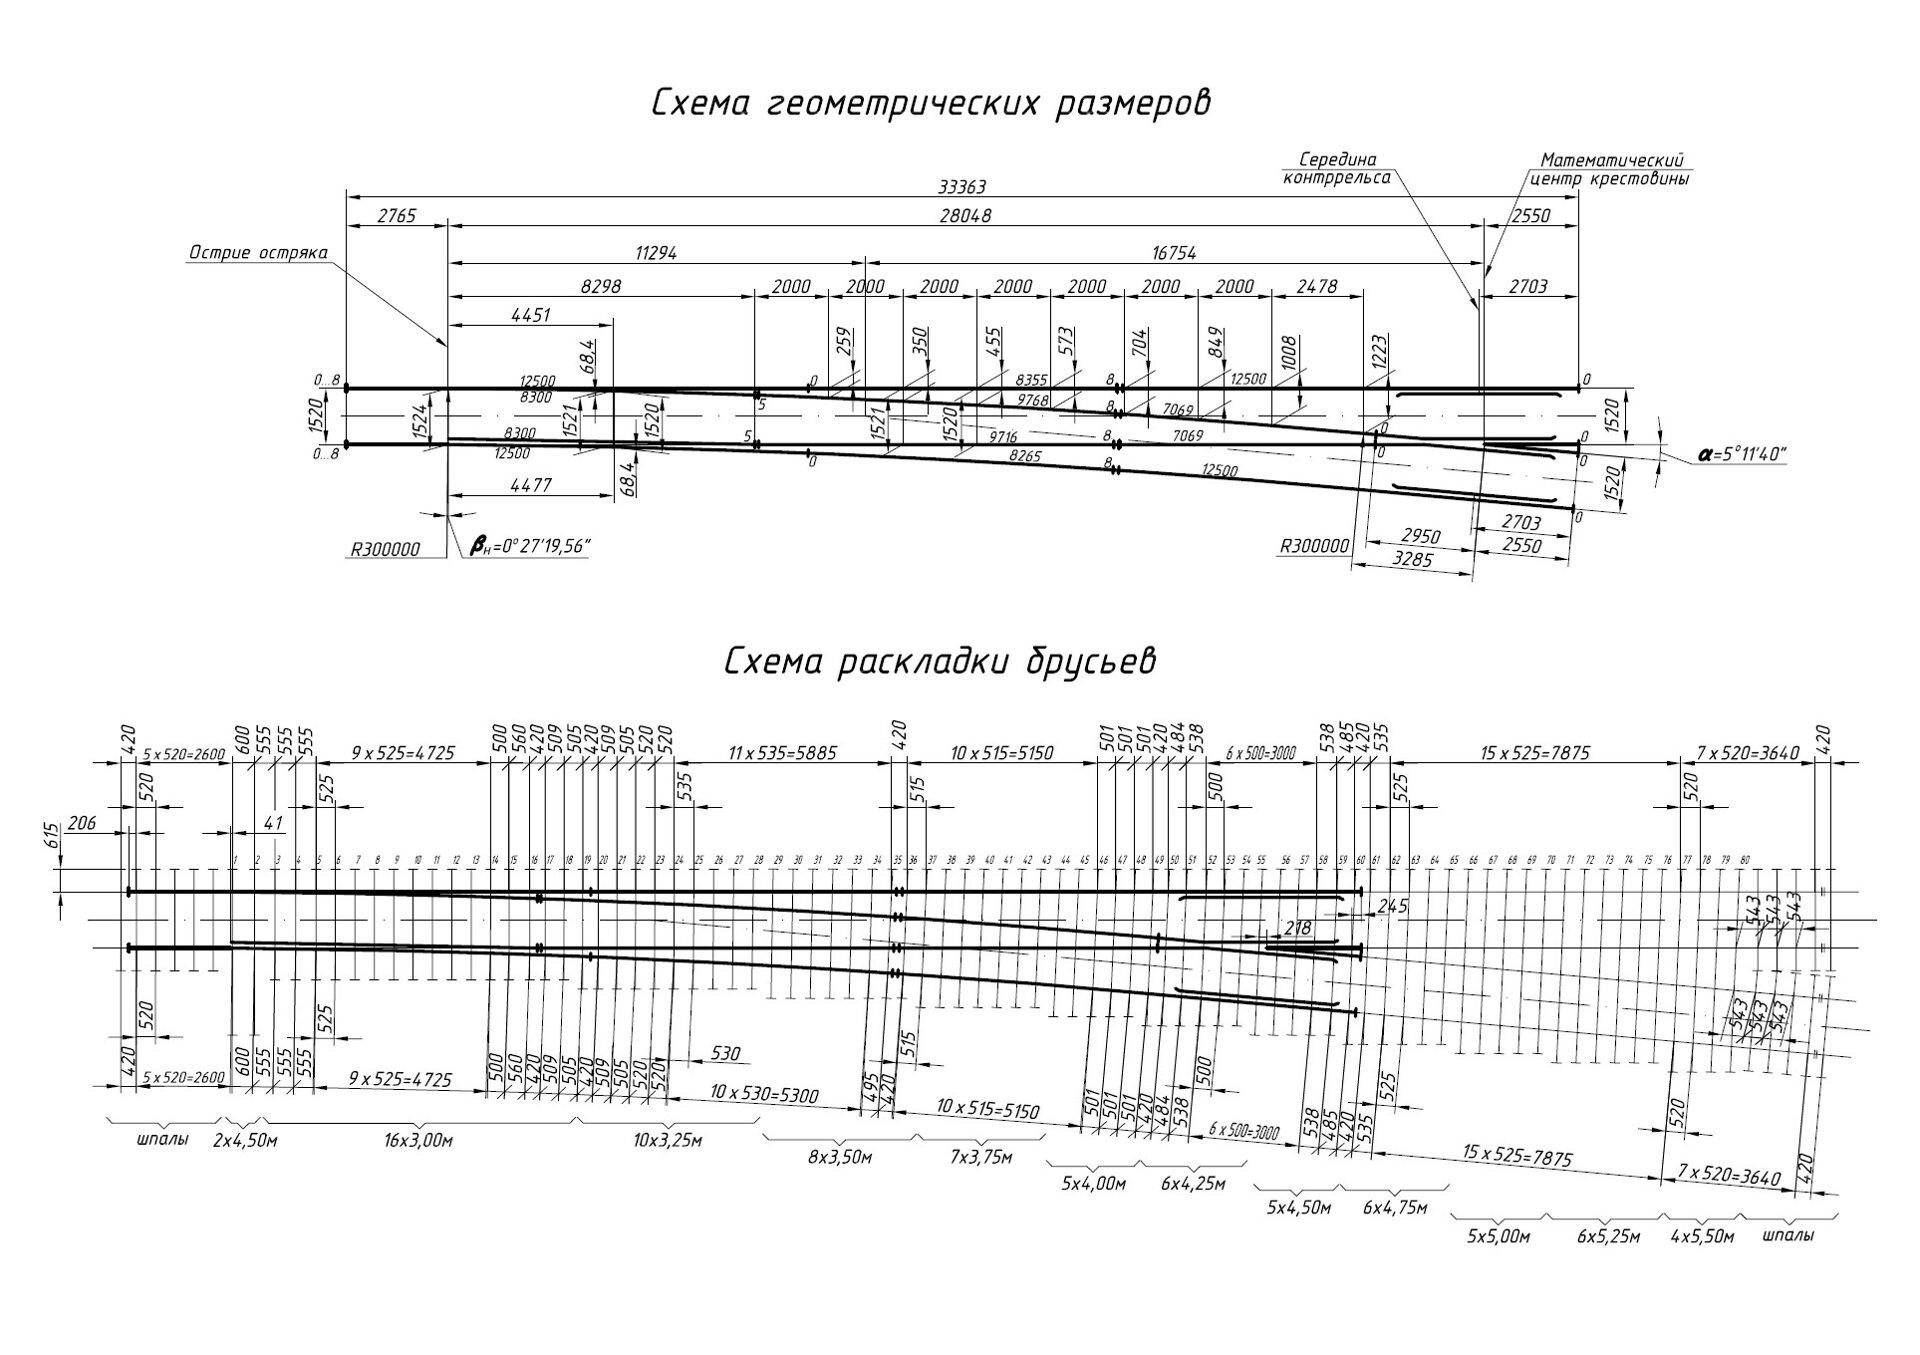 Стрелочные переводы Р65 1/11 проект 2433 резерв - фото pic_e8ac0c5e1efe7df7110d270579748bdd_1920x9000_1.jpg